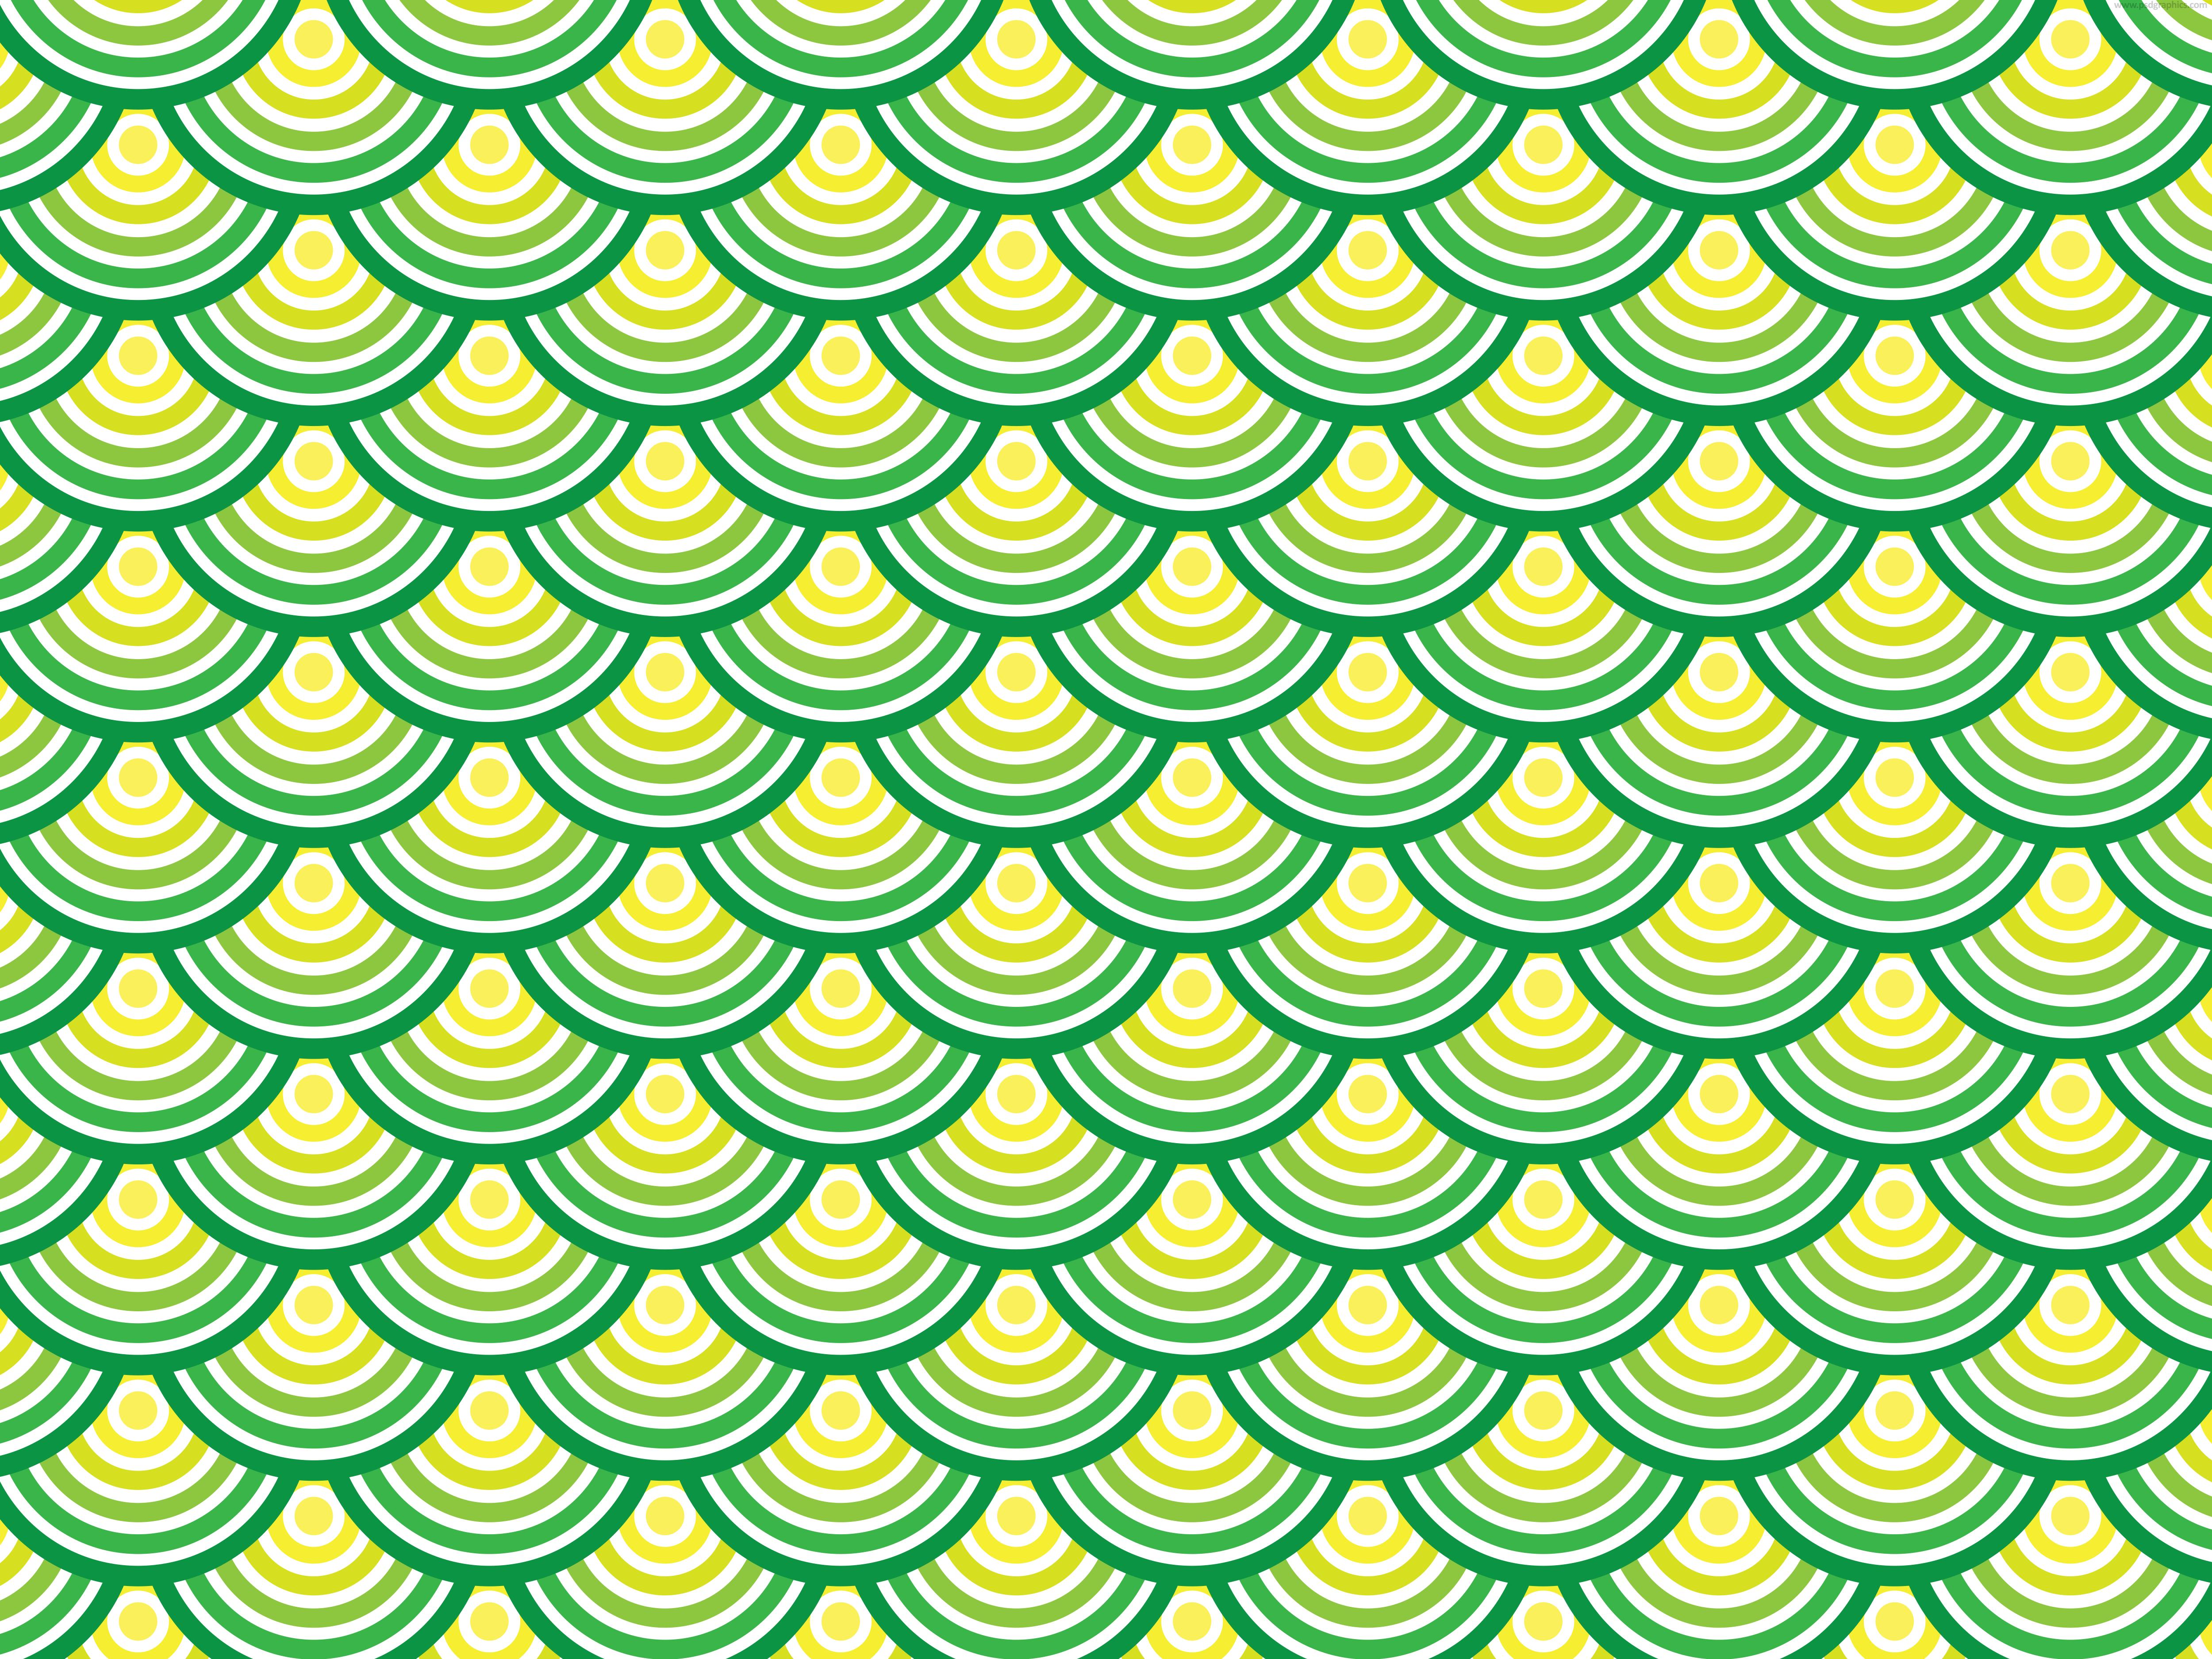 Green circles pattern